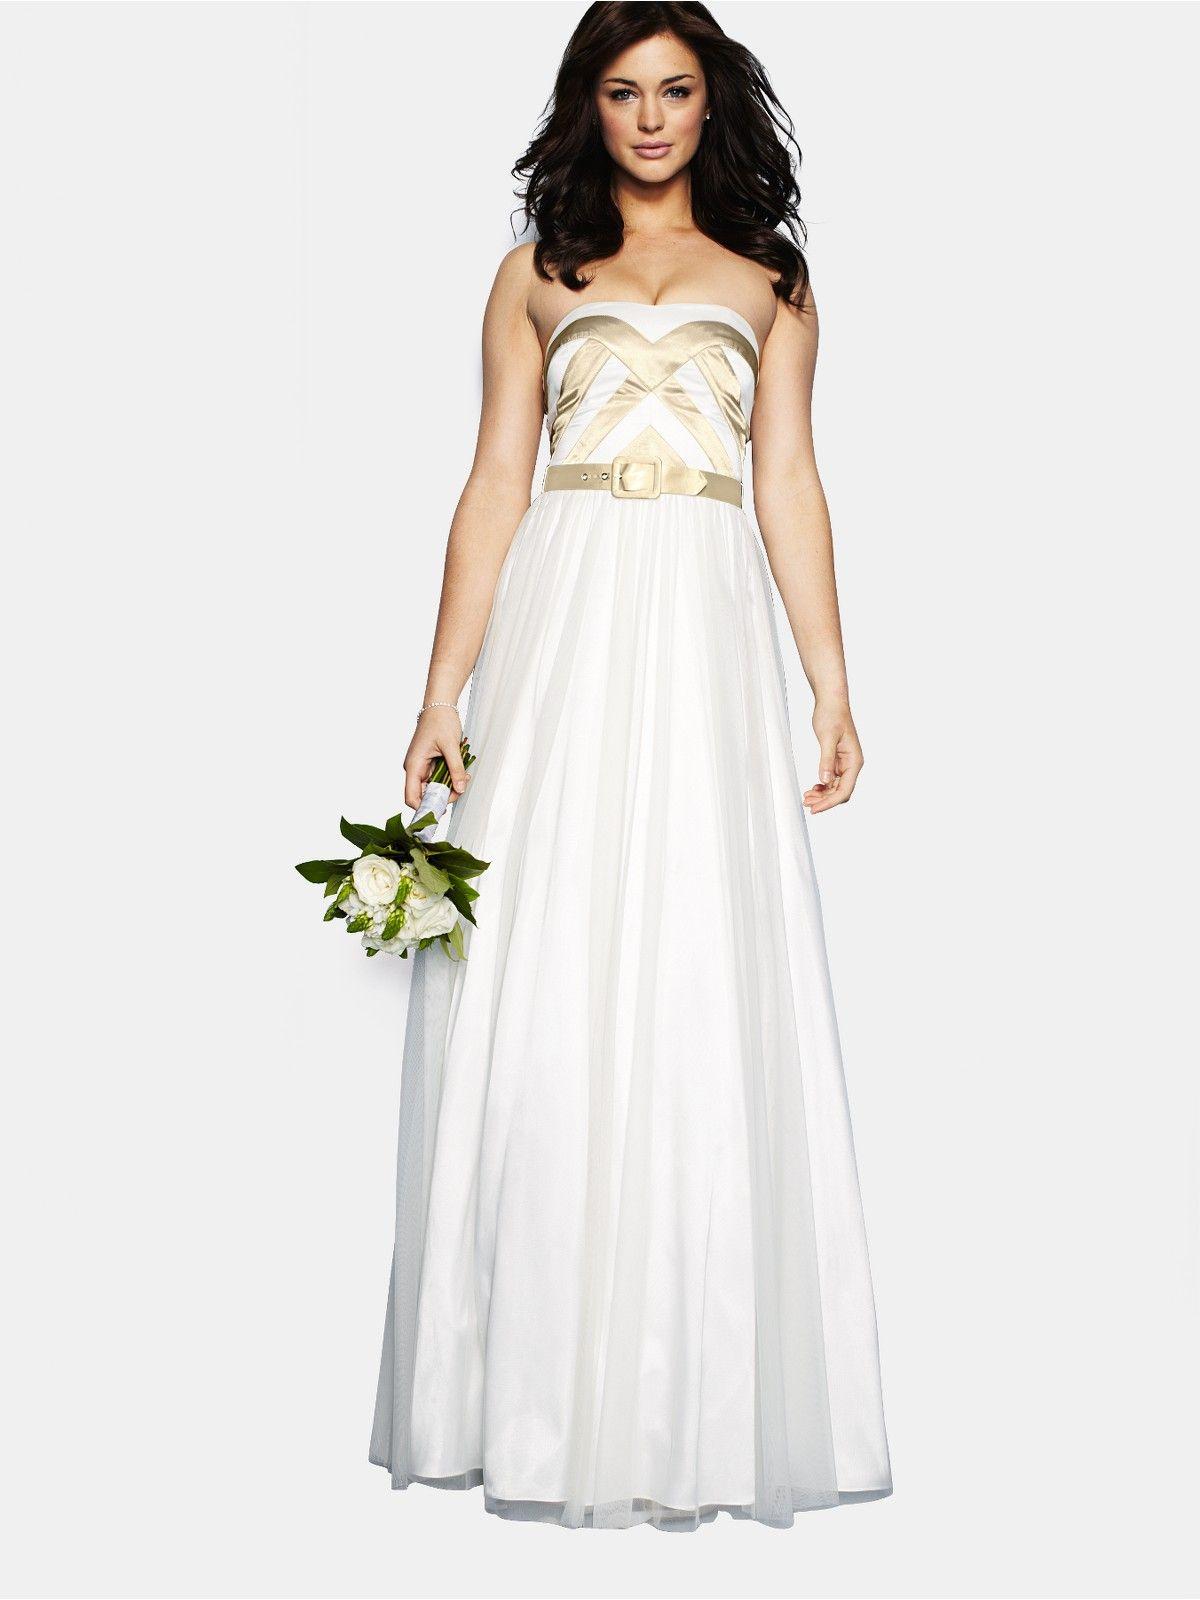 Strapless Prom Wedding Dress Very.co.uk